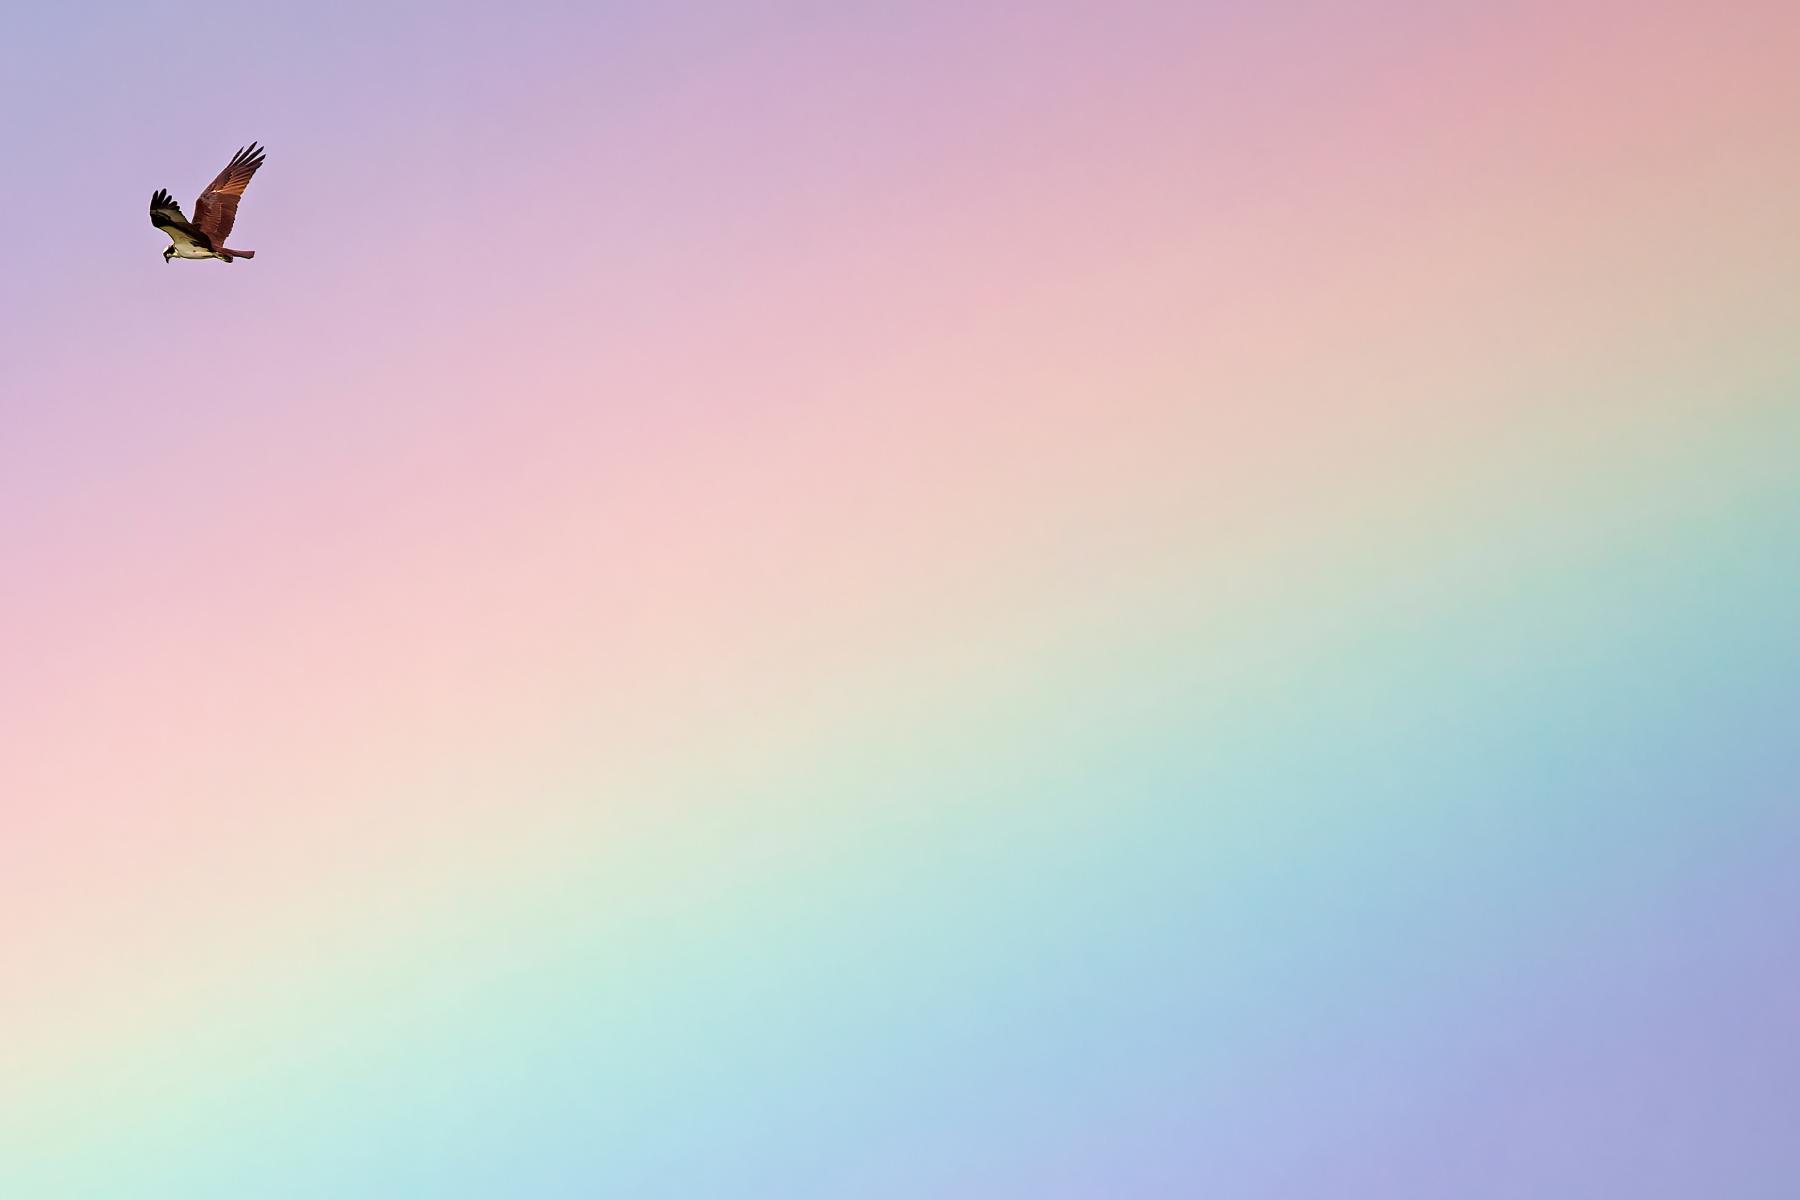 Osprey flies through a rainbow